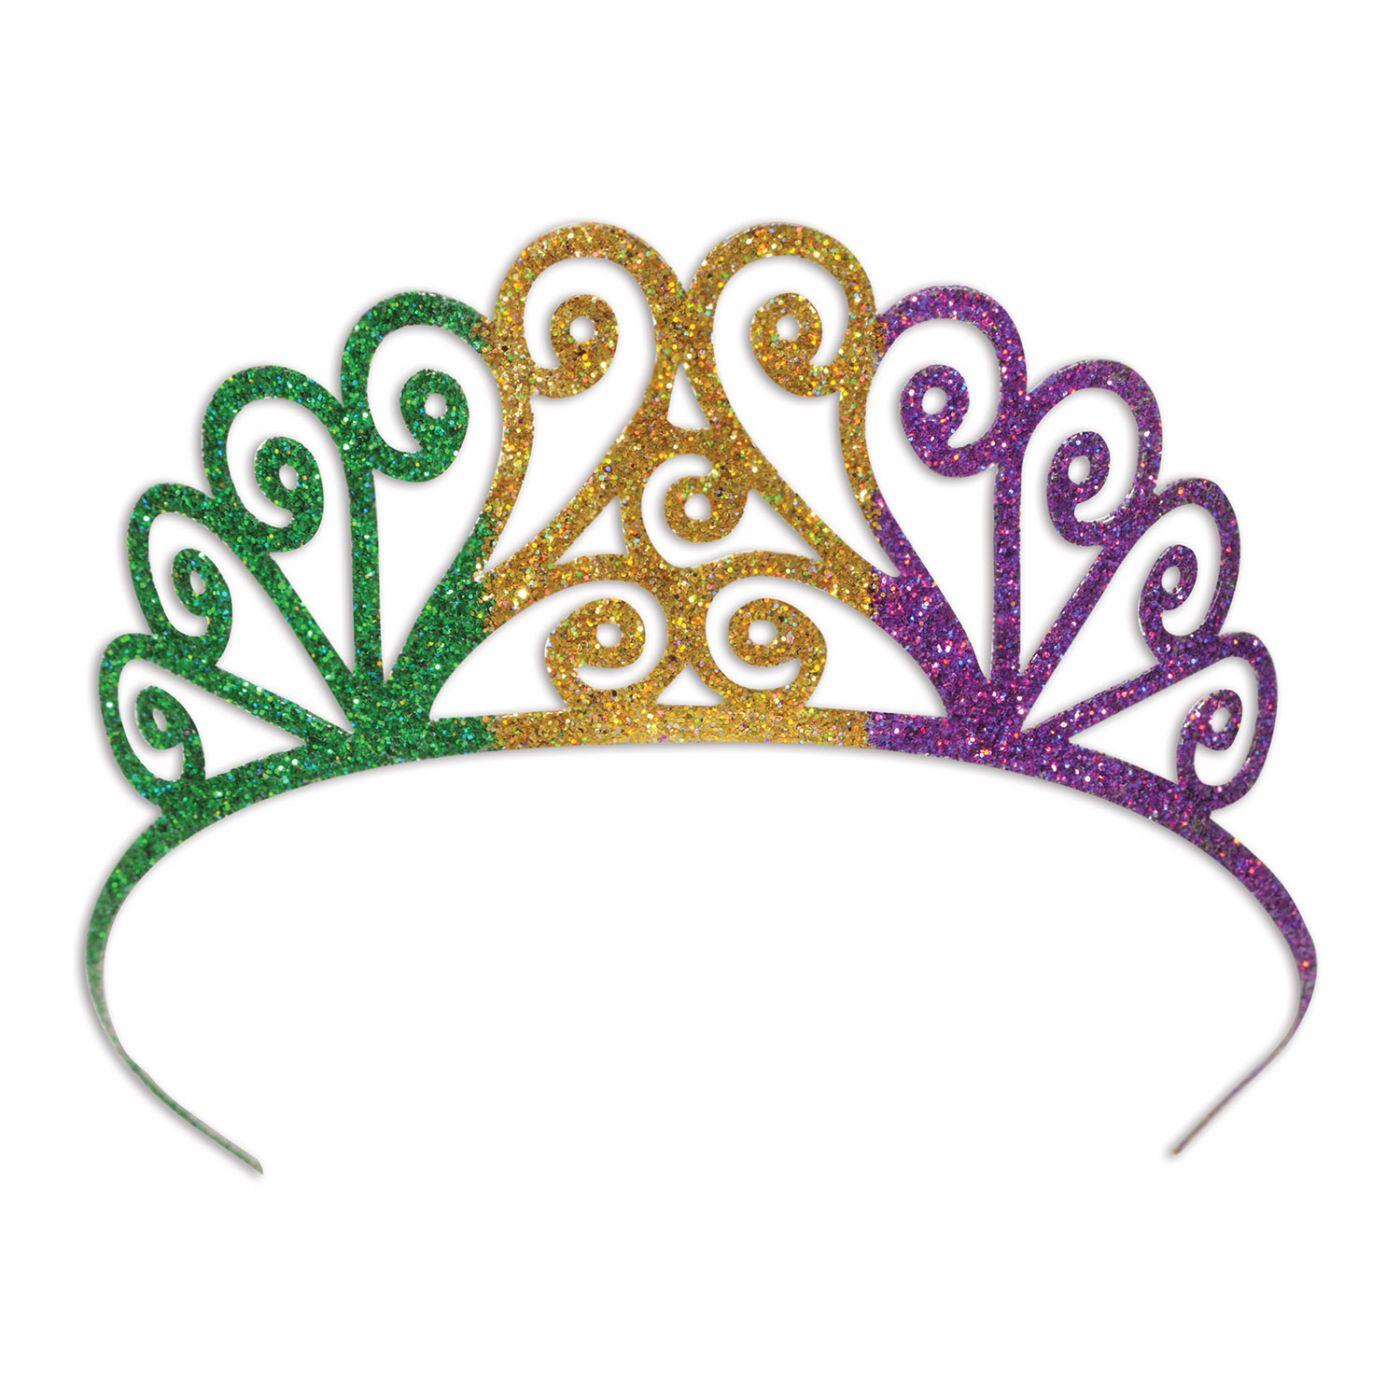 Glittered Metal Mardi Gras Tiara (6) image